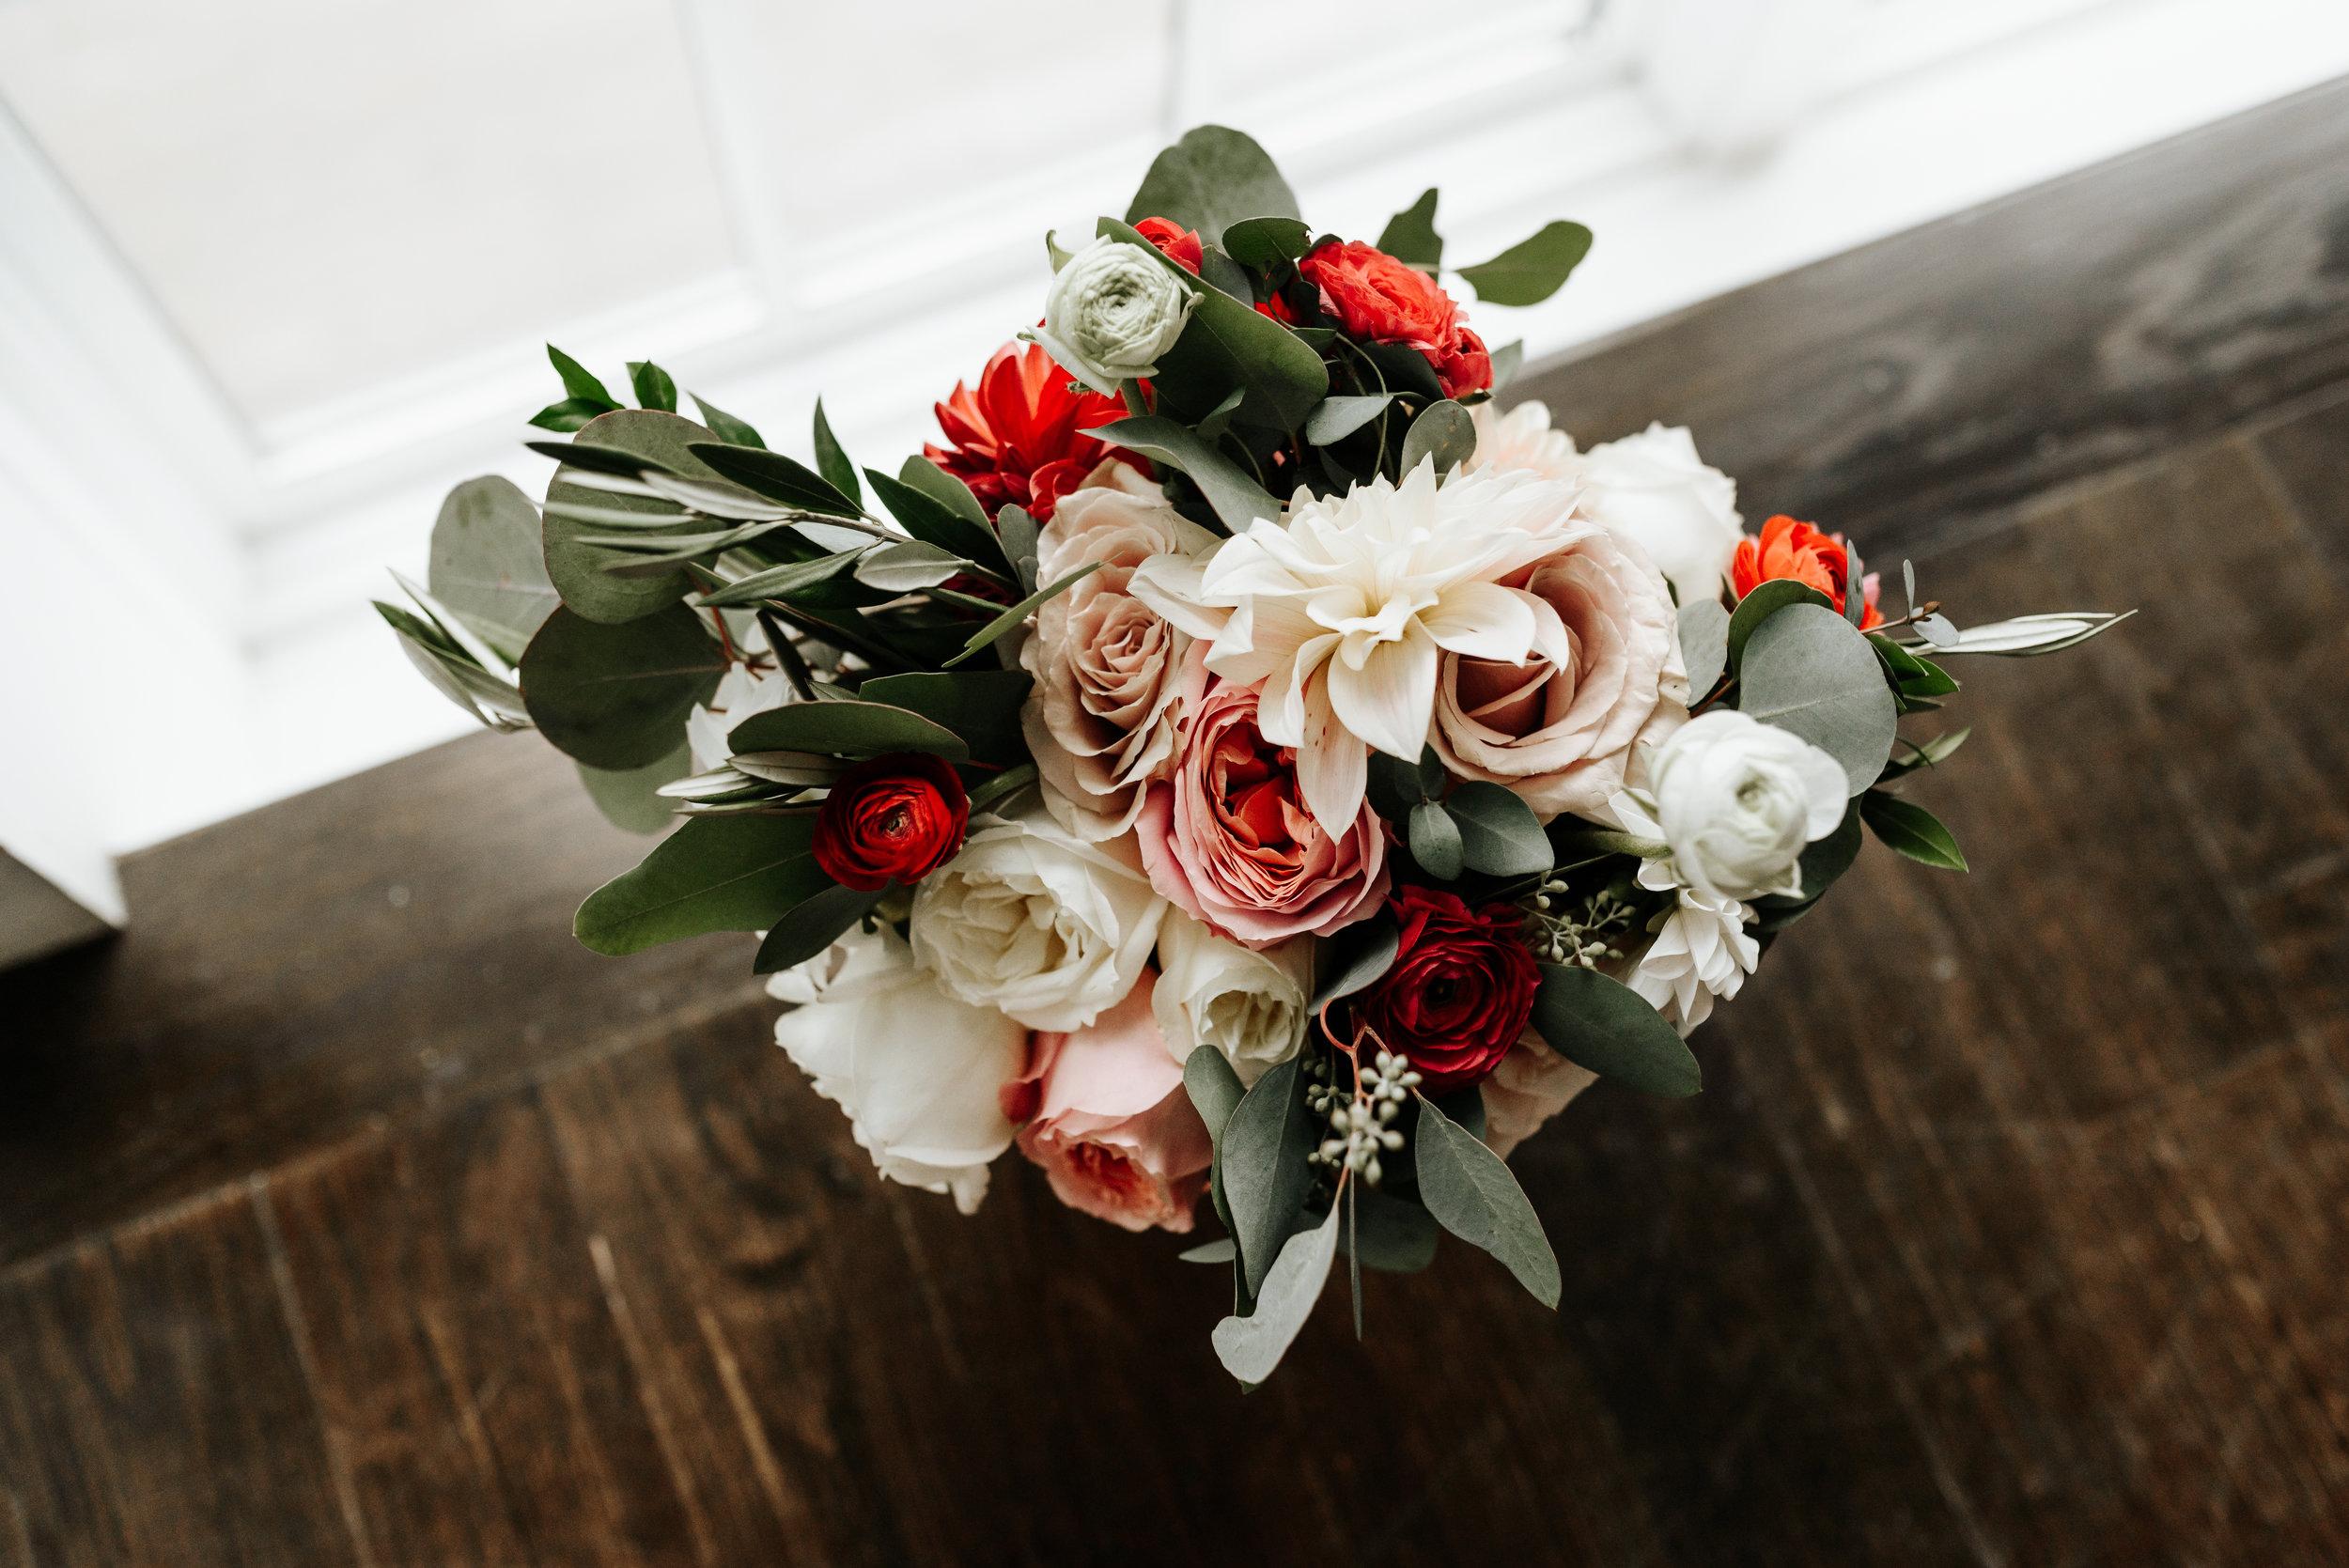 Veritas-Vineyards-and-Winery-Wedding-Photography-Afton-Virginia-Yasmin-Seth-Photography-by-V-9036.jpg